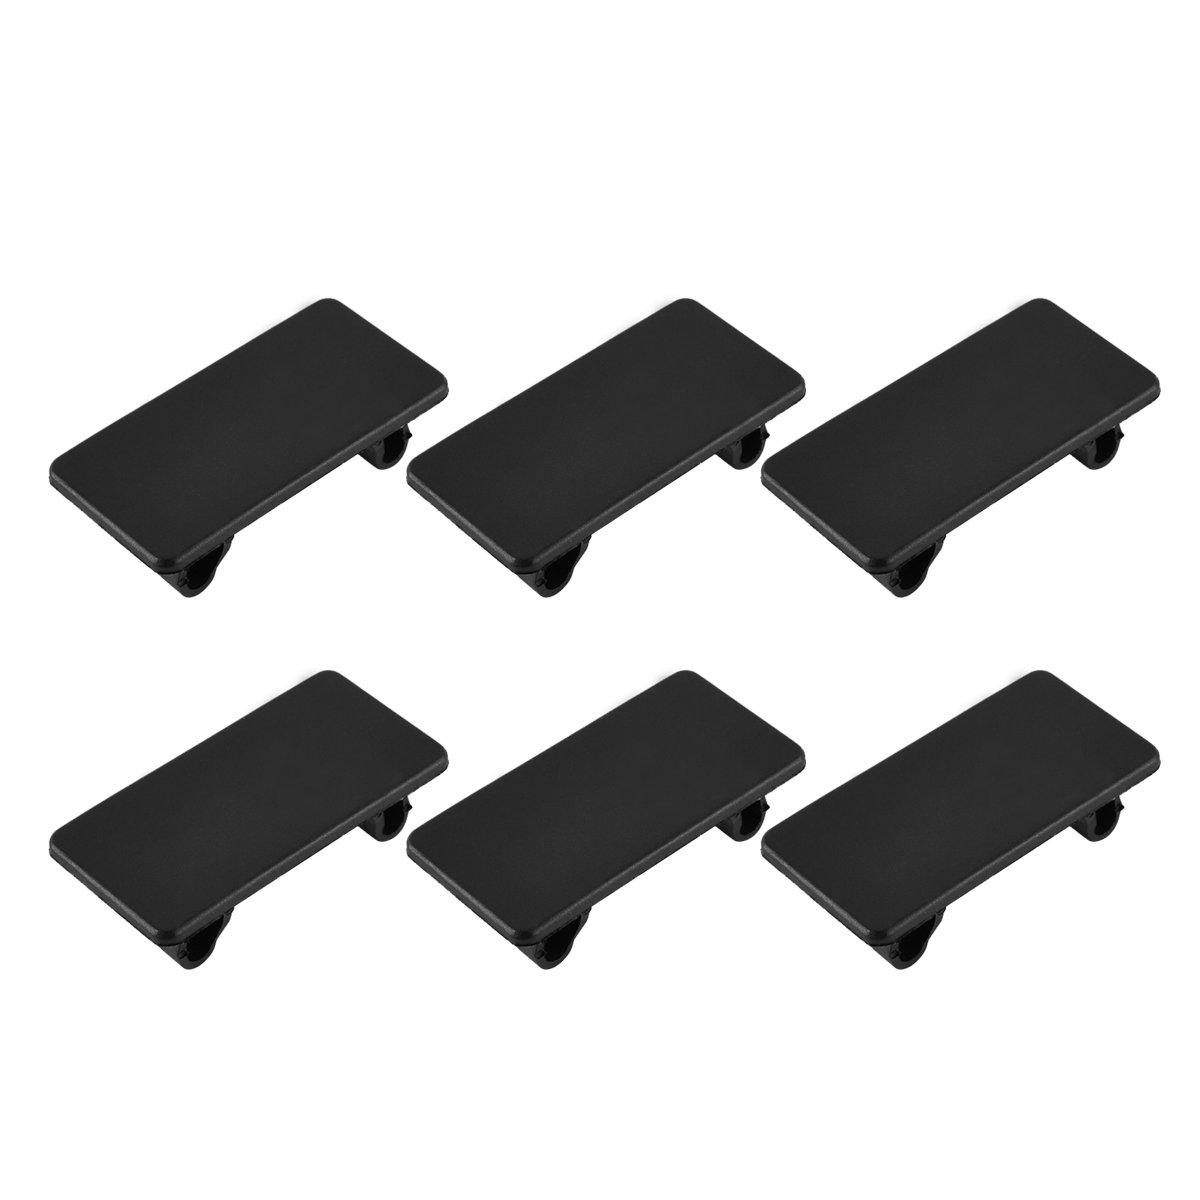 Rocker Switch Panel Max 44% OFF Cover AutoEC Automotive Toggle Max 56% OFF Hole